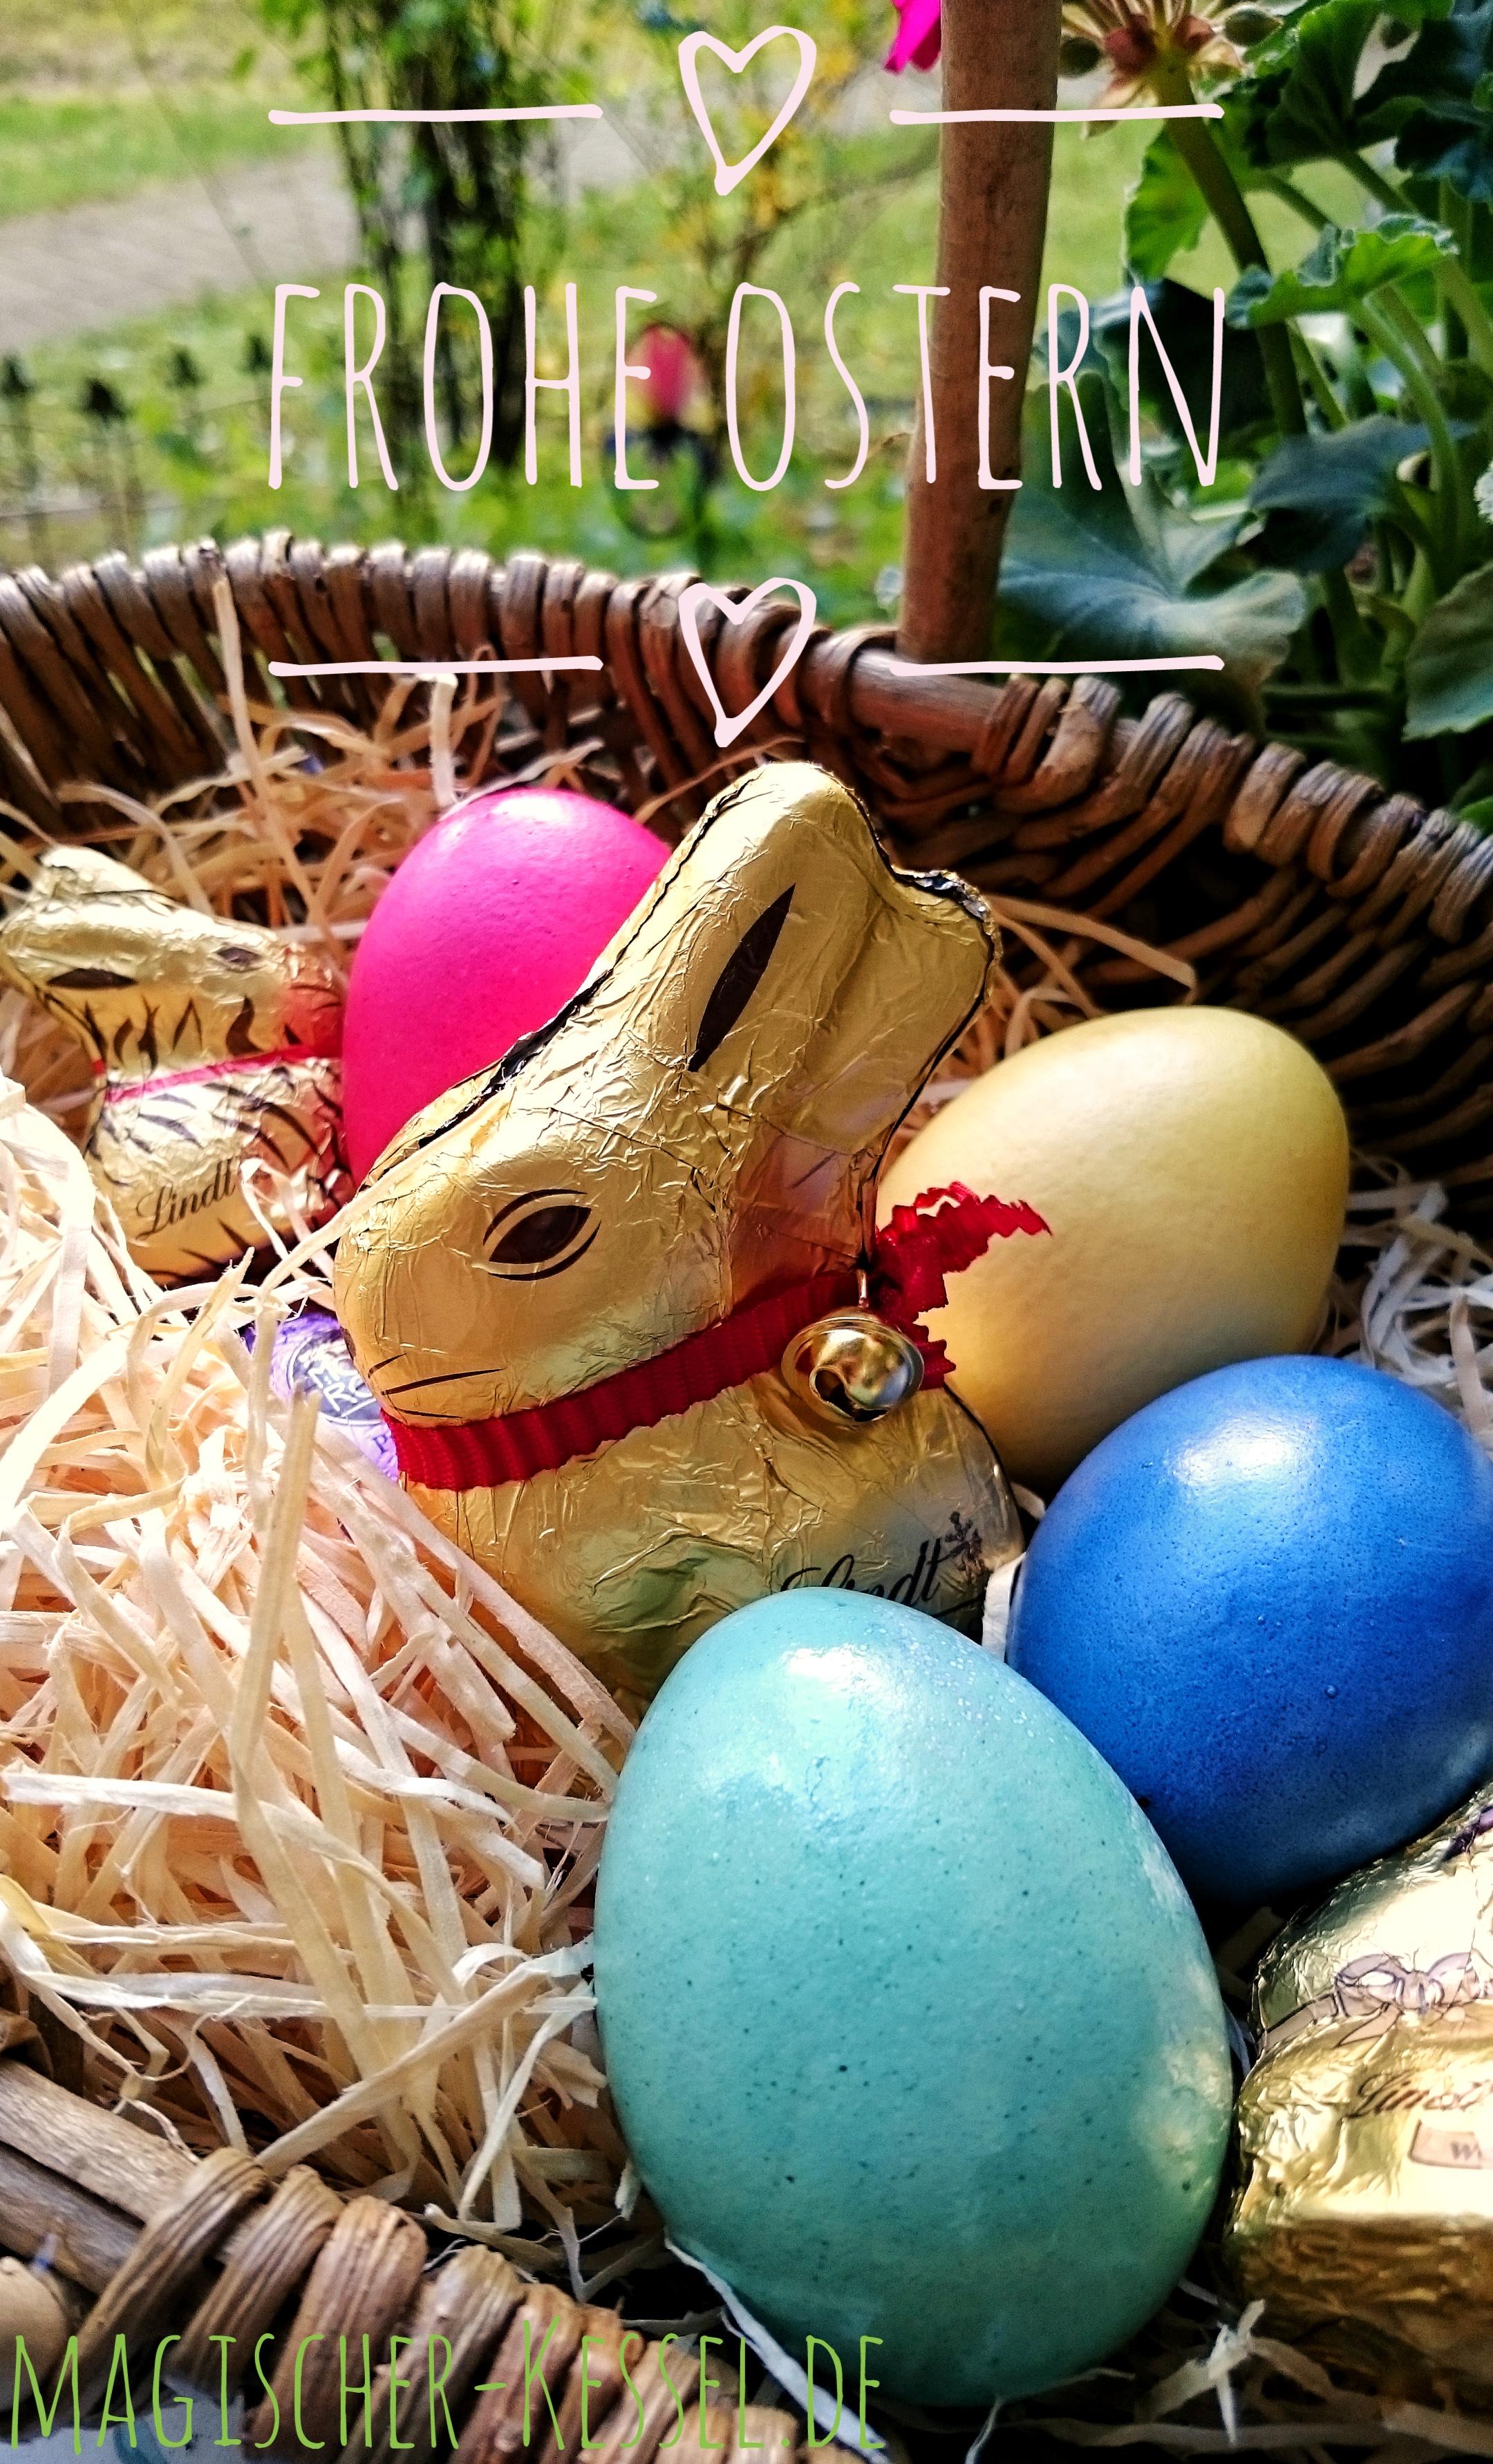 "Das Berliner Foodblog ""Der magische Kessel"" wünscht frohe Ostern"